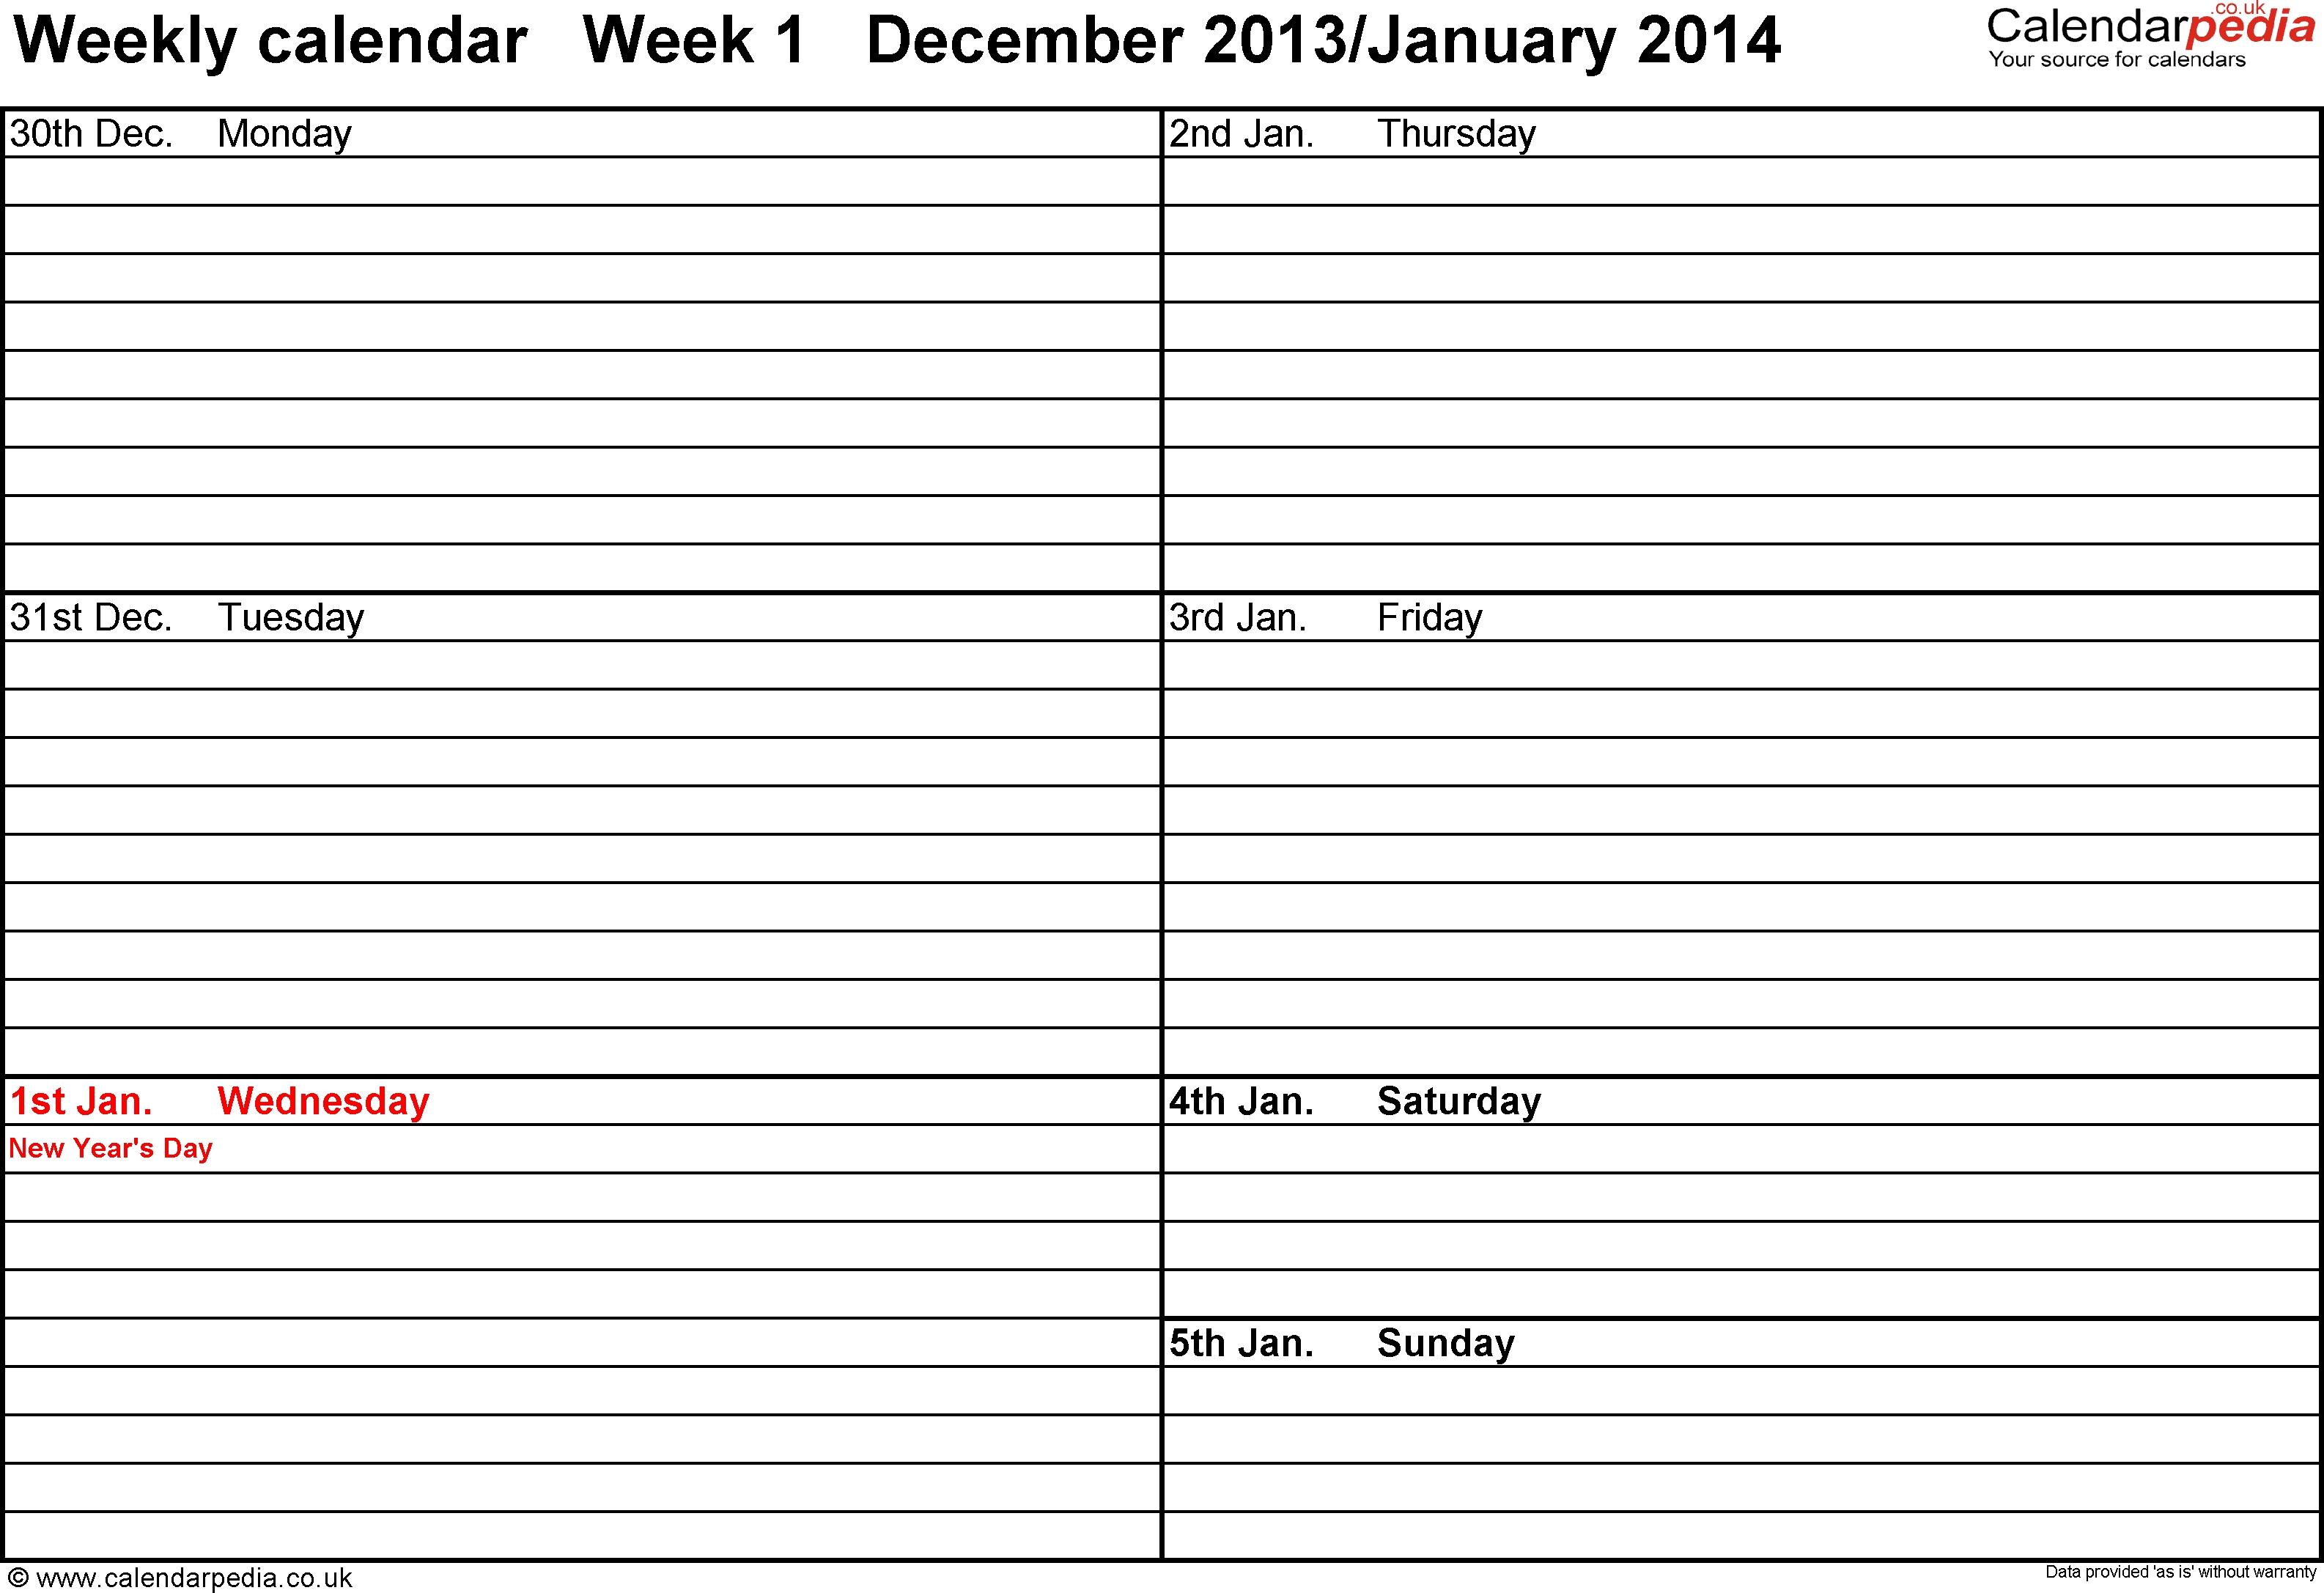 One Week Calendar Template Word - Wallofcoins.wallofcoins.tk throughout Free Day To Day Calendar